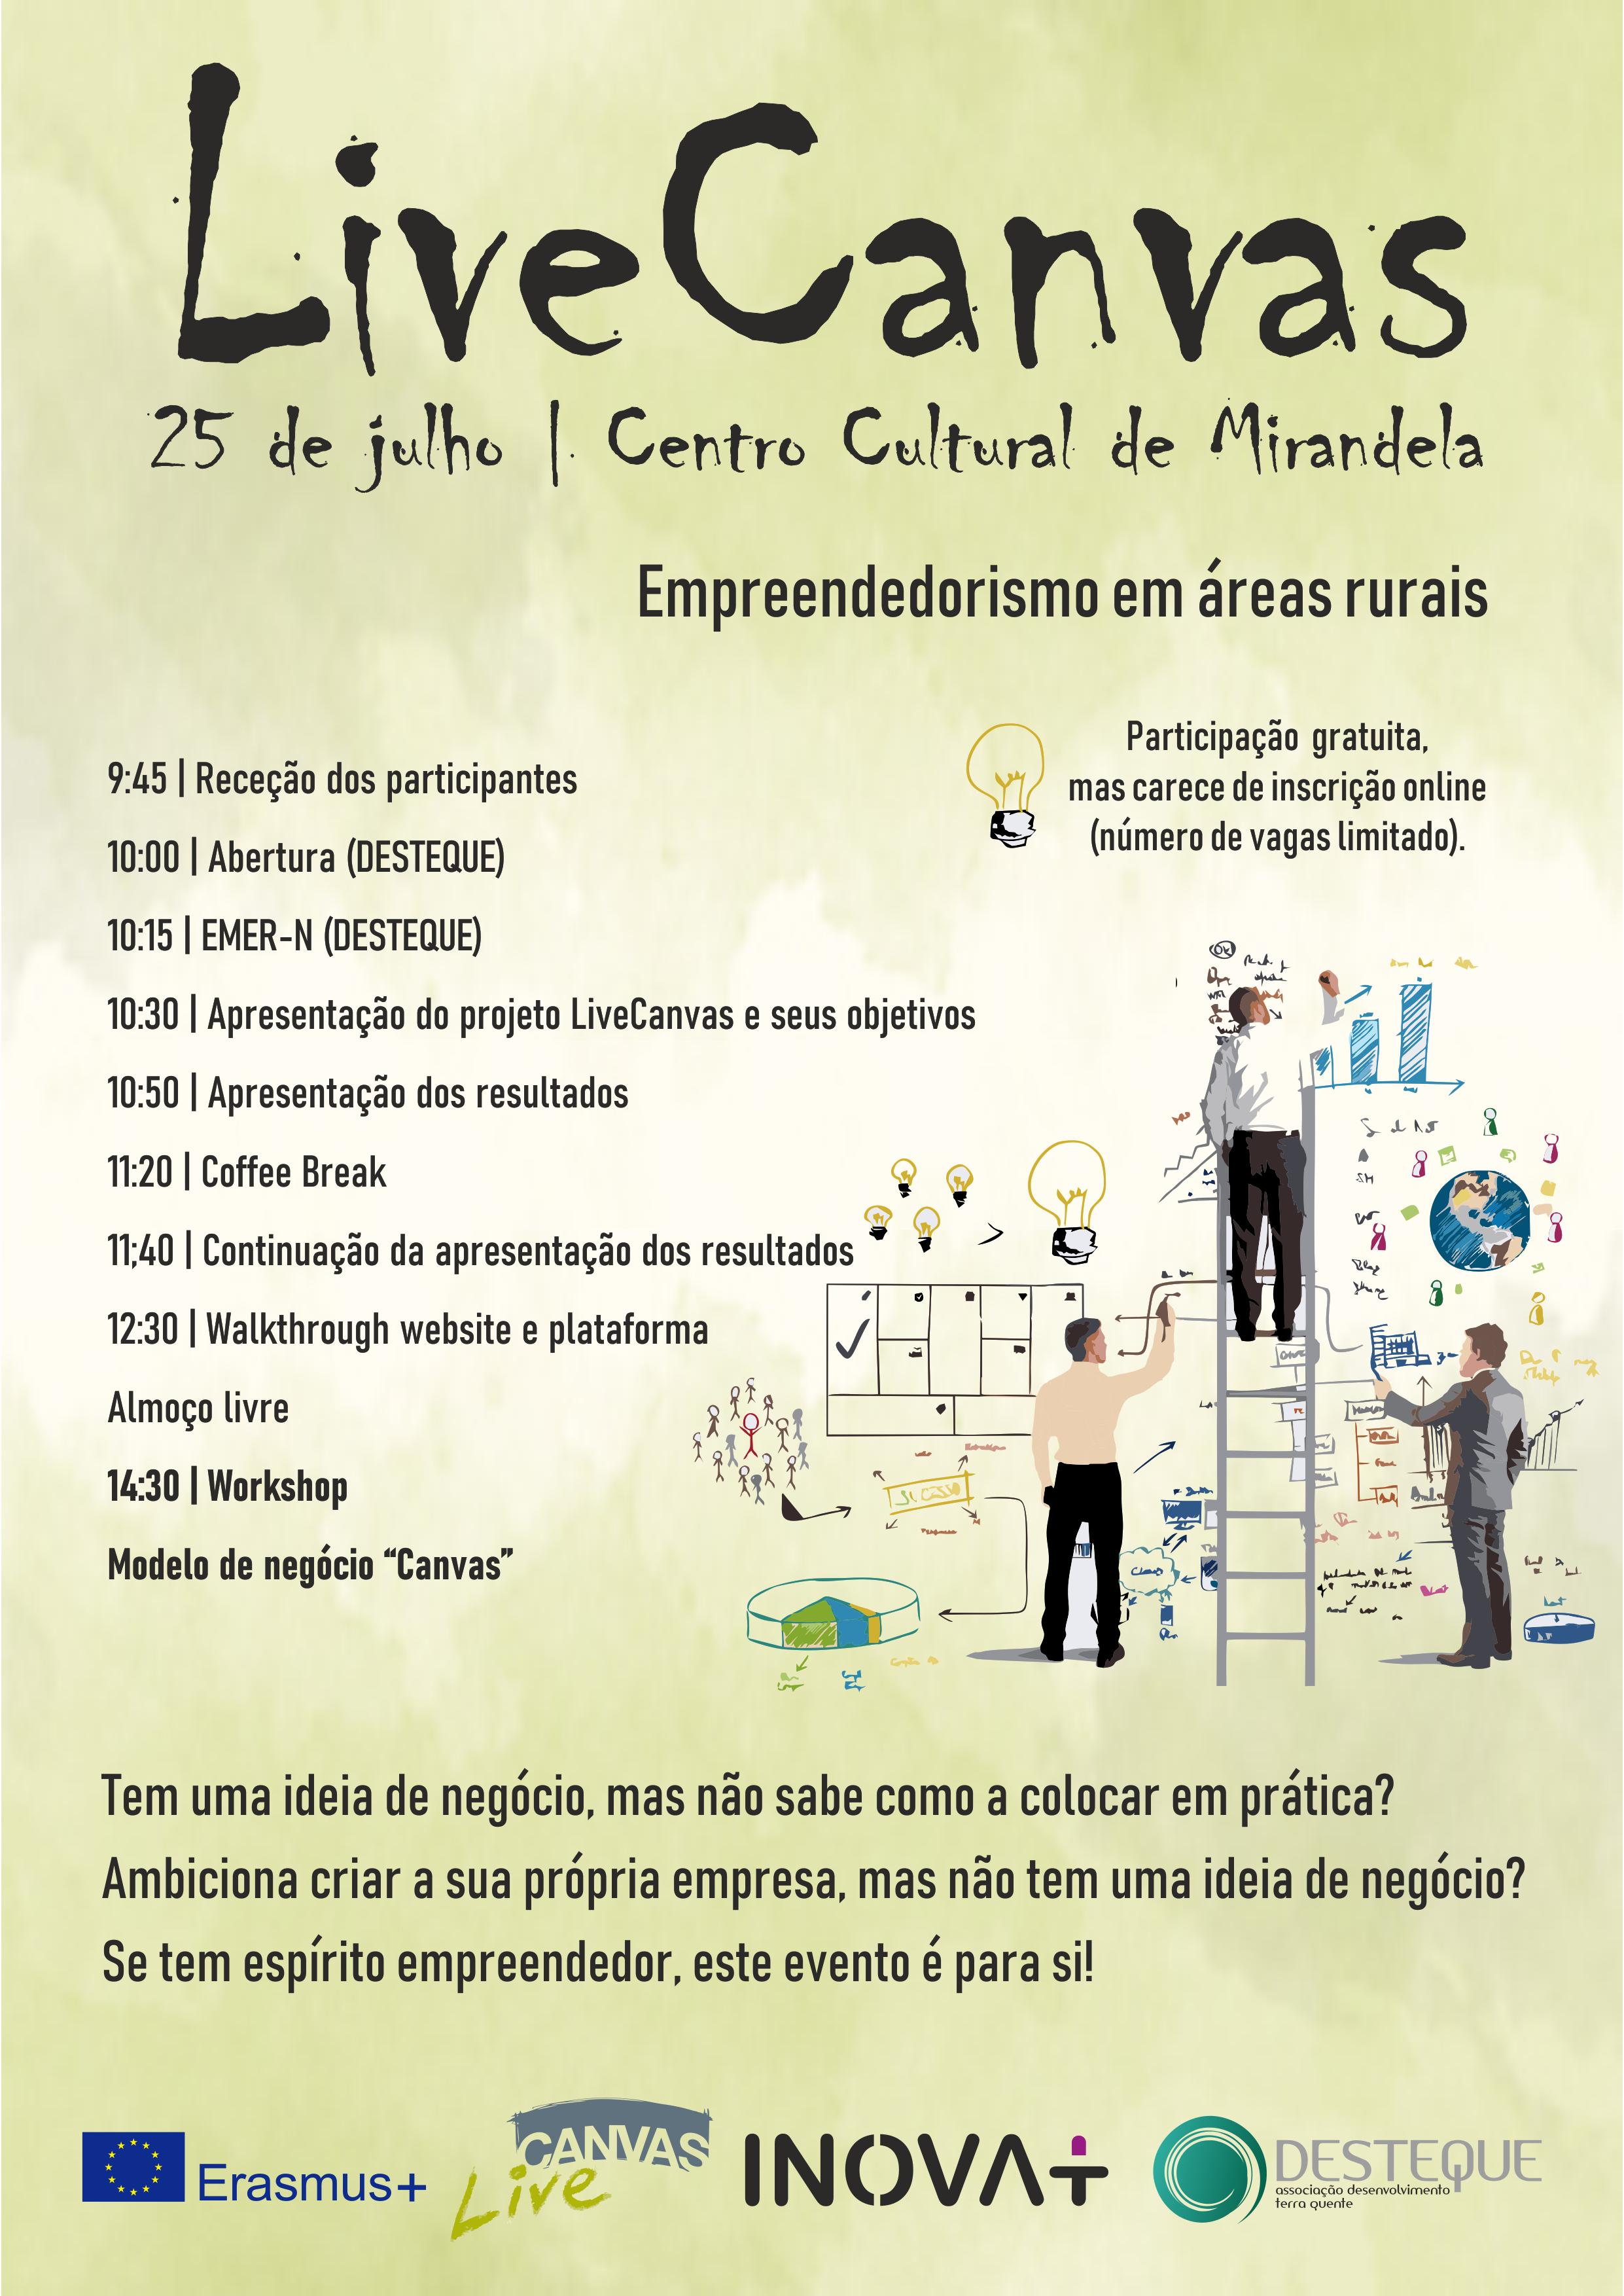 Empreendedorismo em Áreas Rurais, Evento + Workshop – LiveCanvas, Centro Cultural de Mirandela